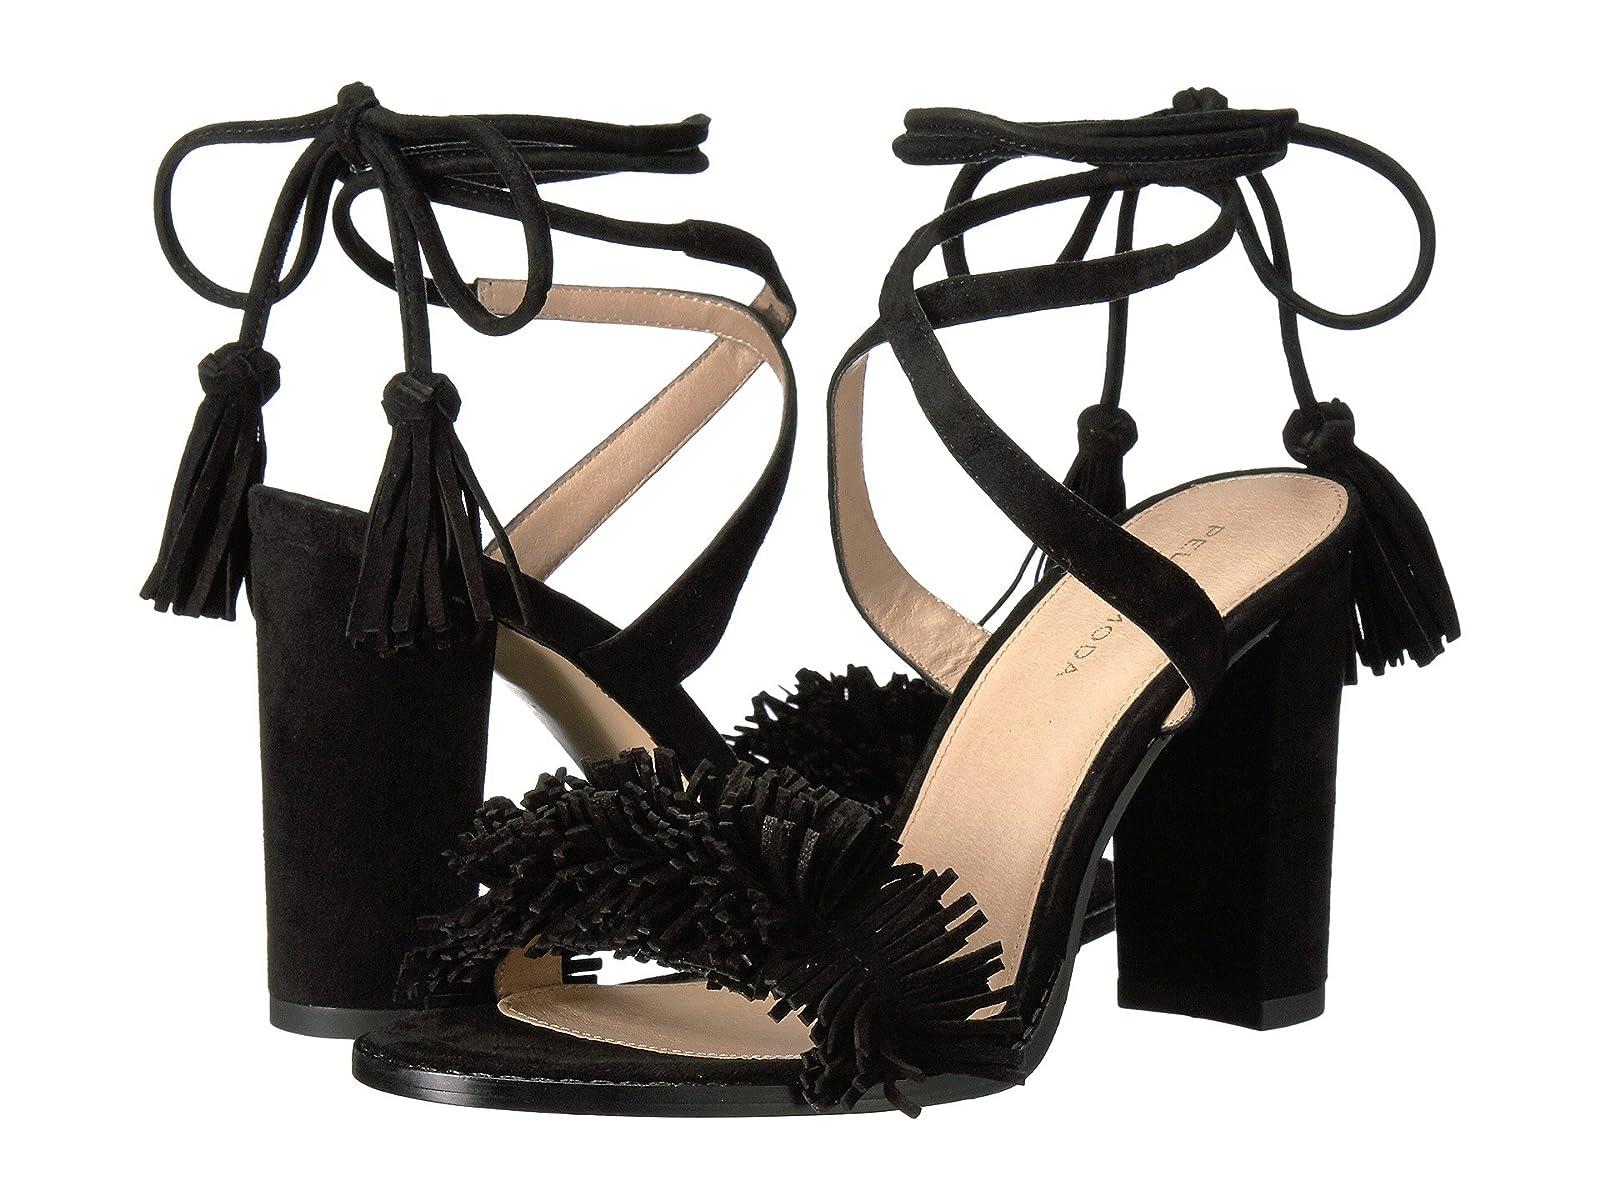 Pelle Moda FayeCheap and distinctive eye-catching shoes